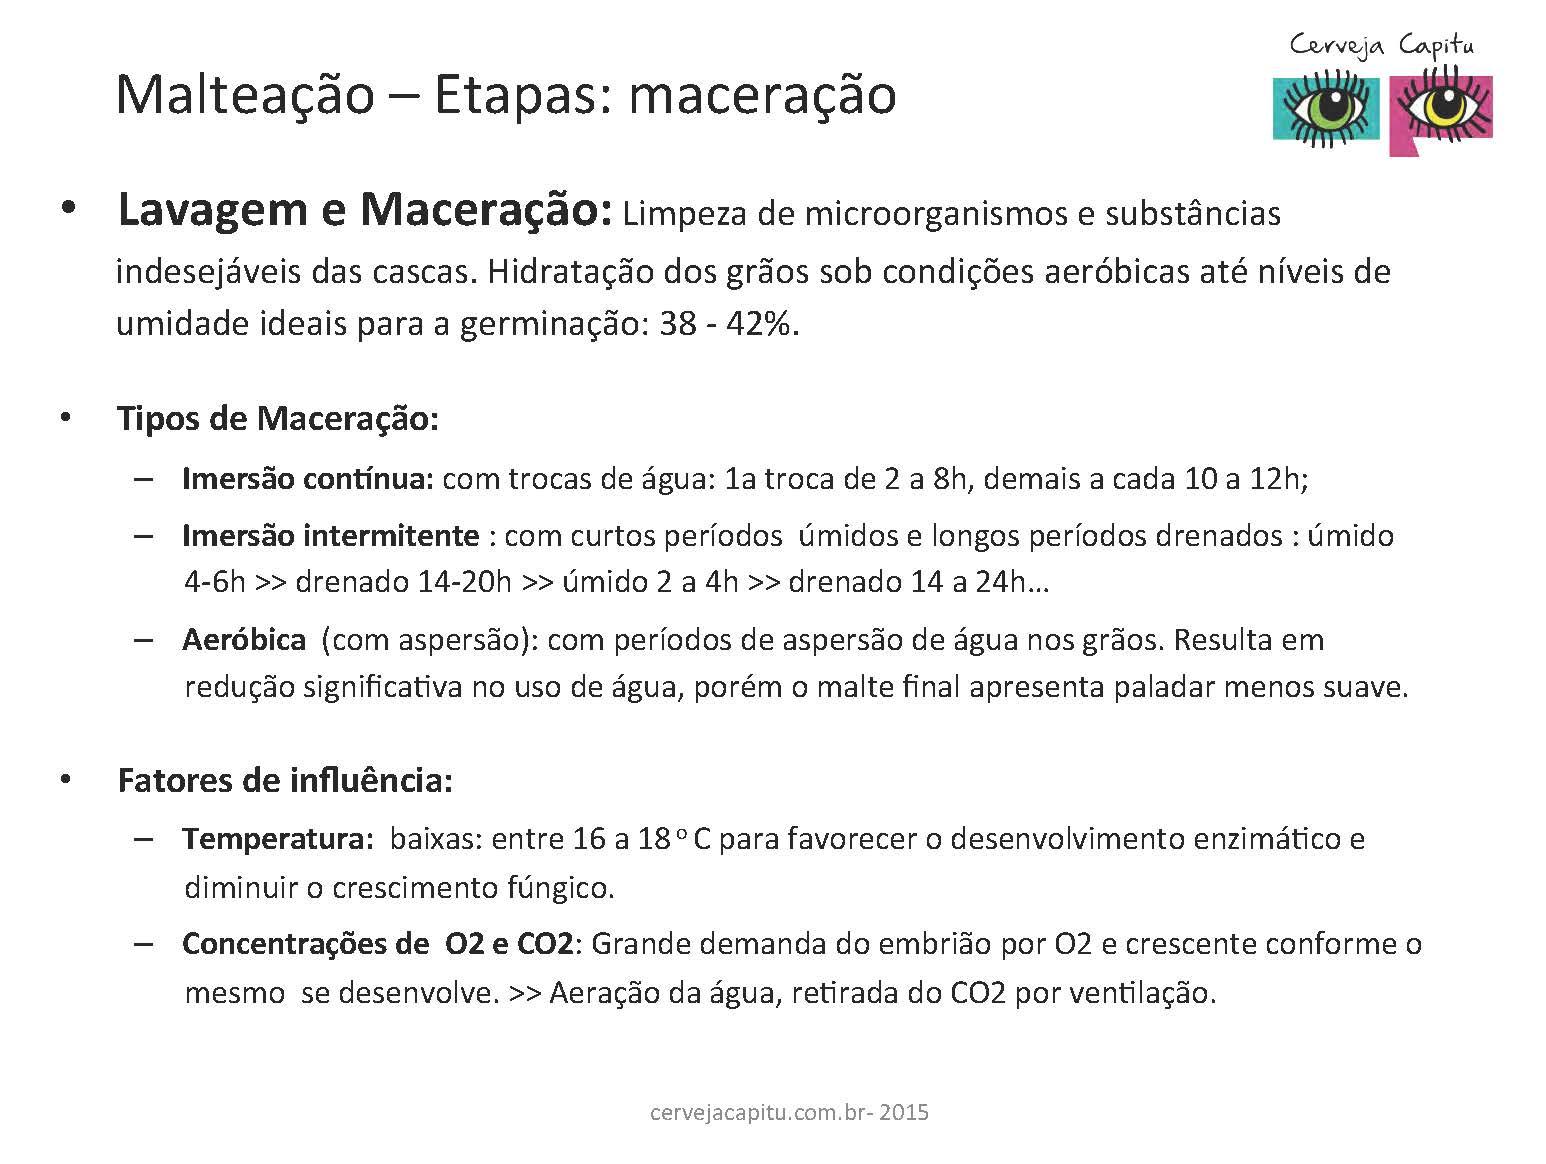 Princípios da Malteação_Capitu_SM_Page_05.jpg